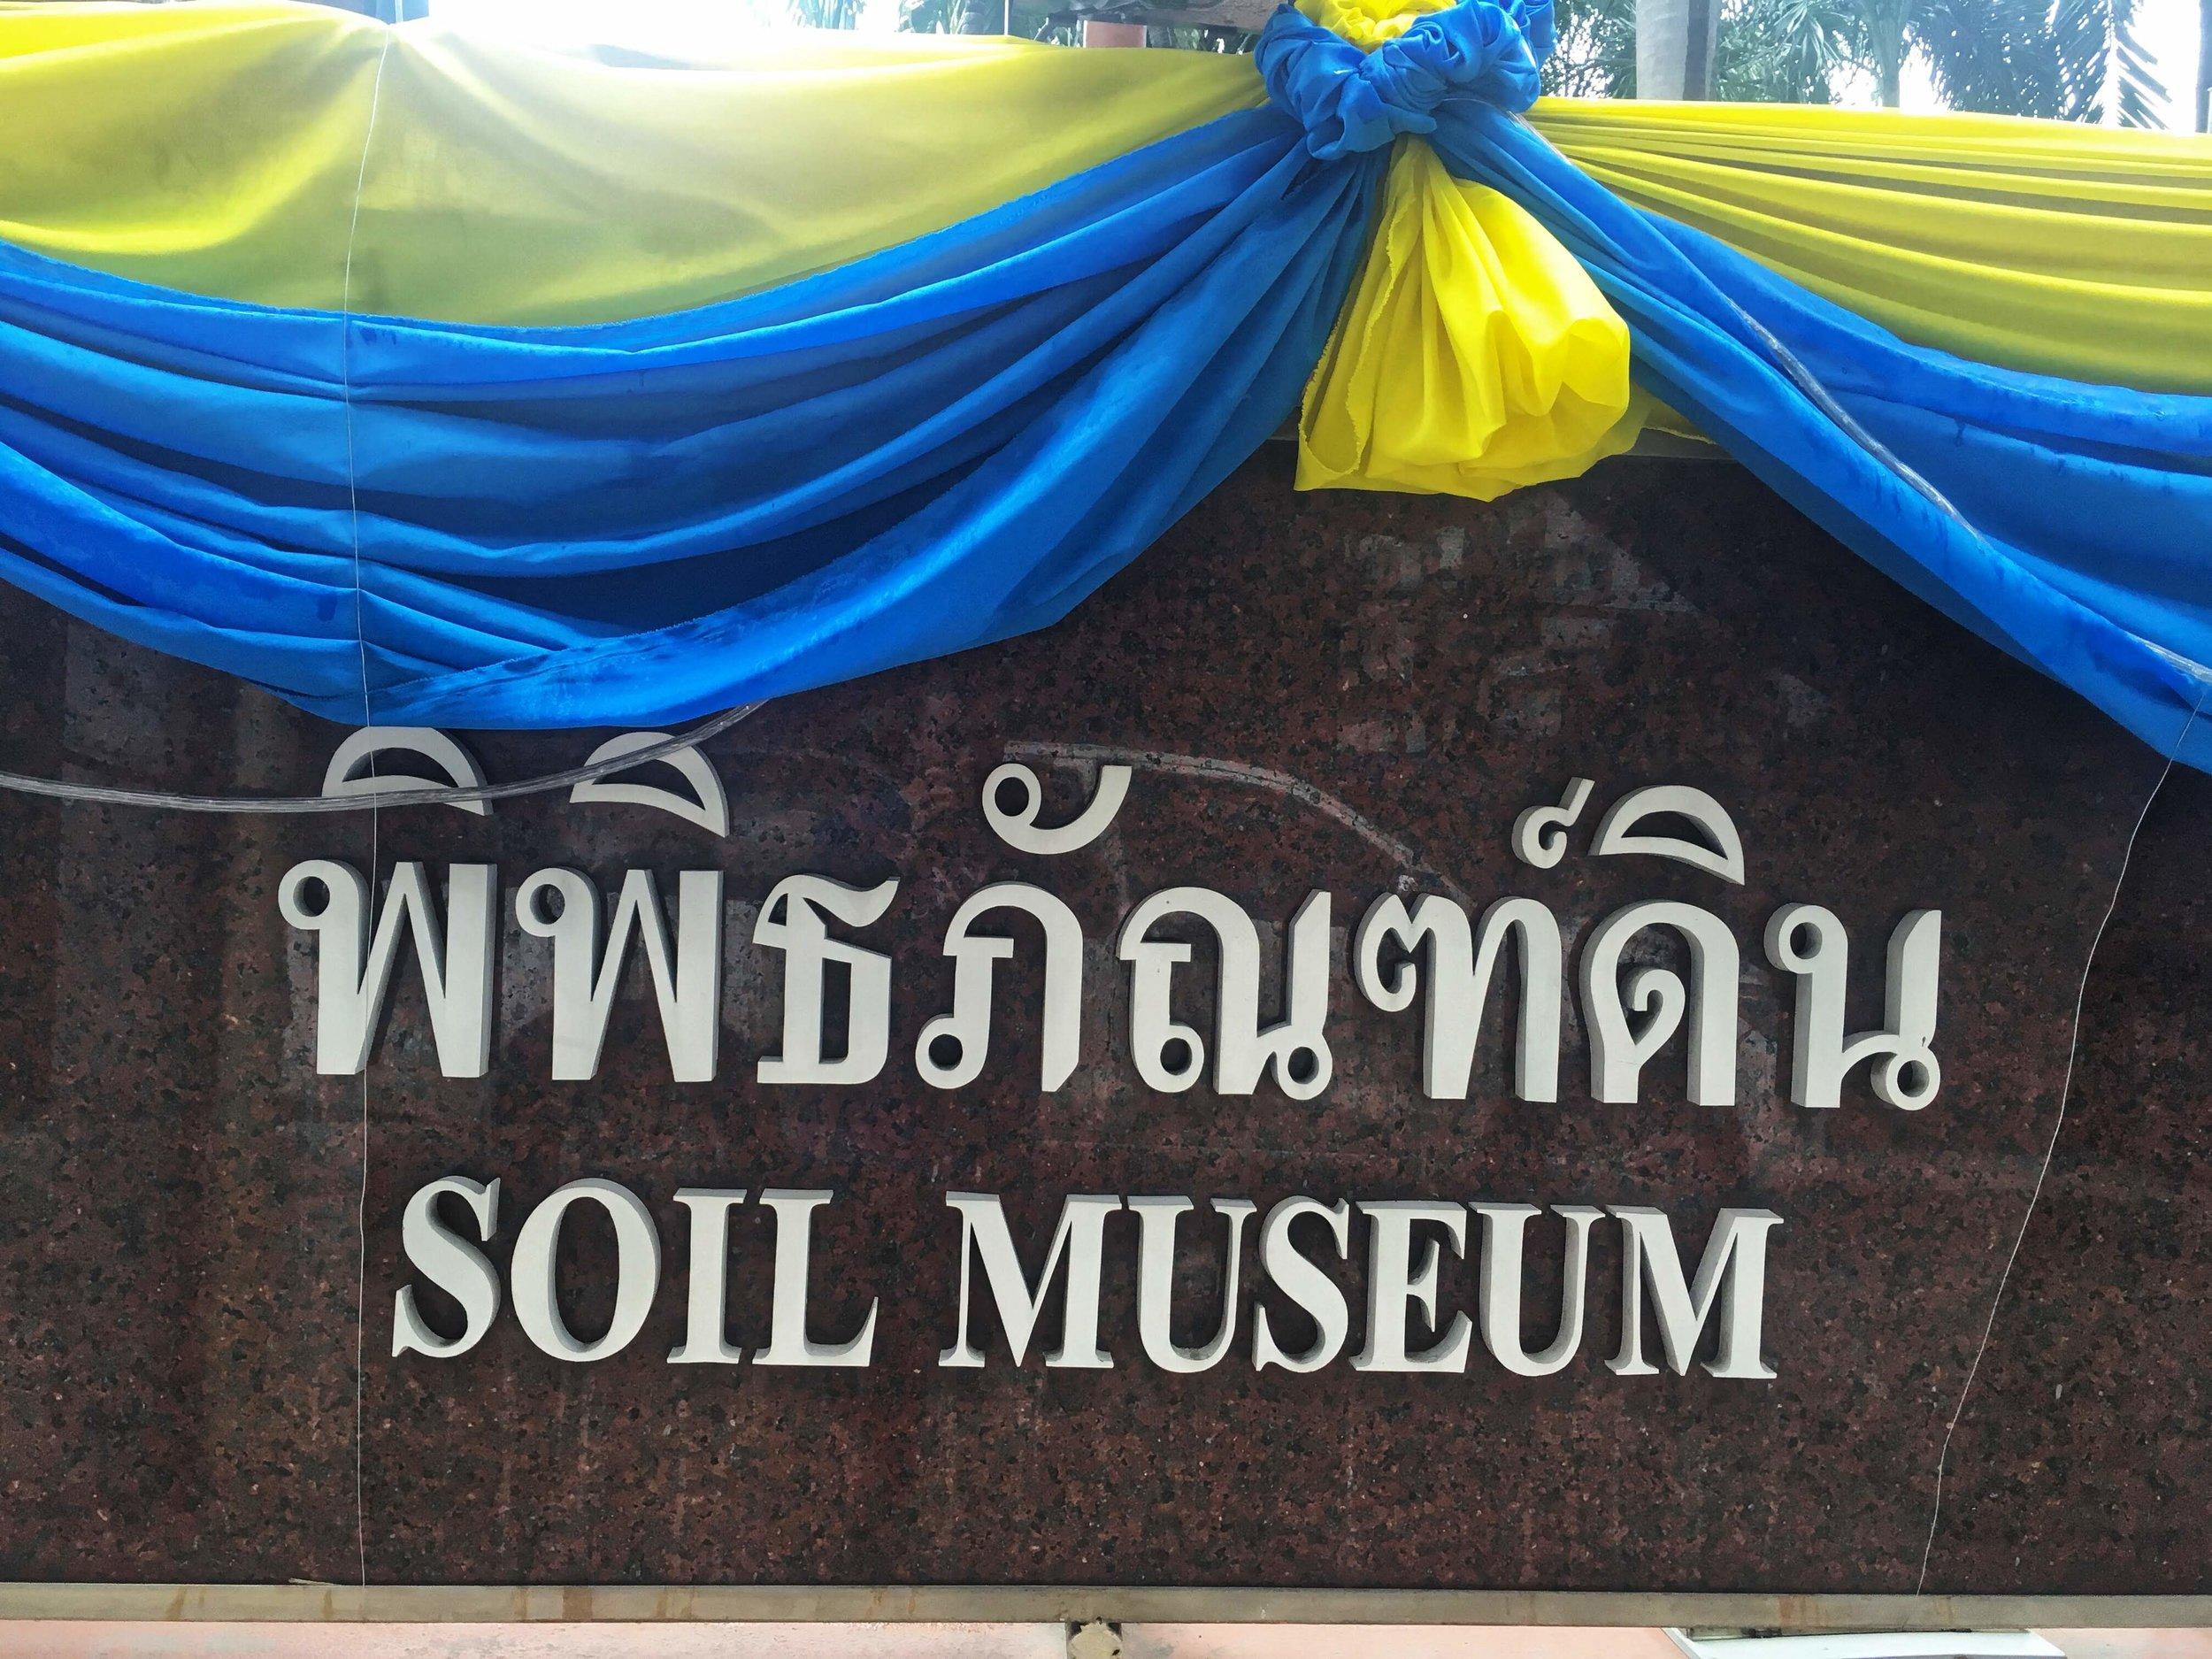 Soil Museum at the Bangkok Land Development Department